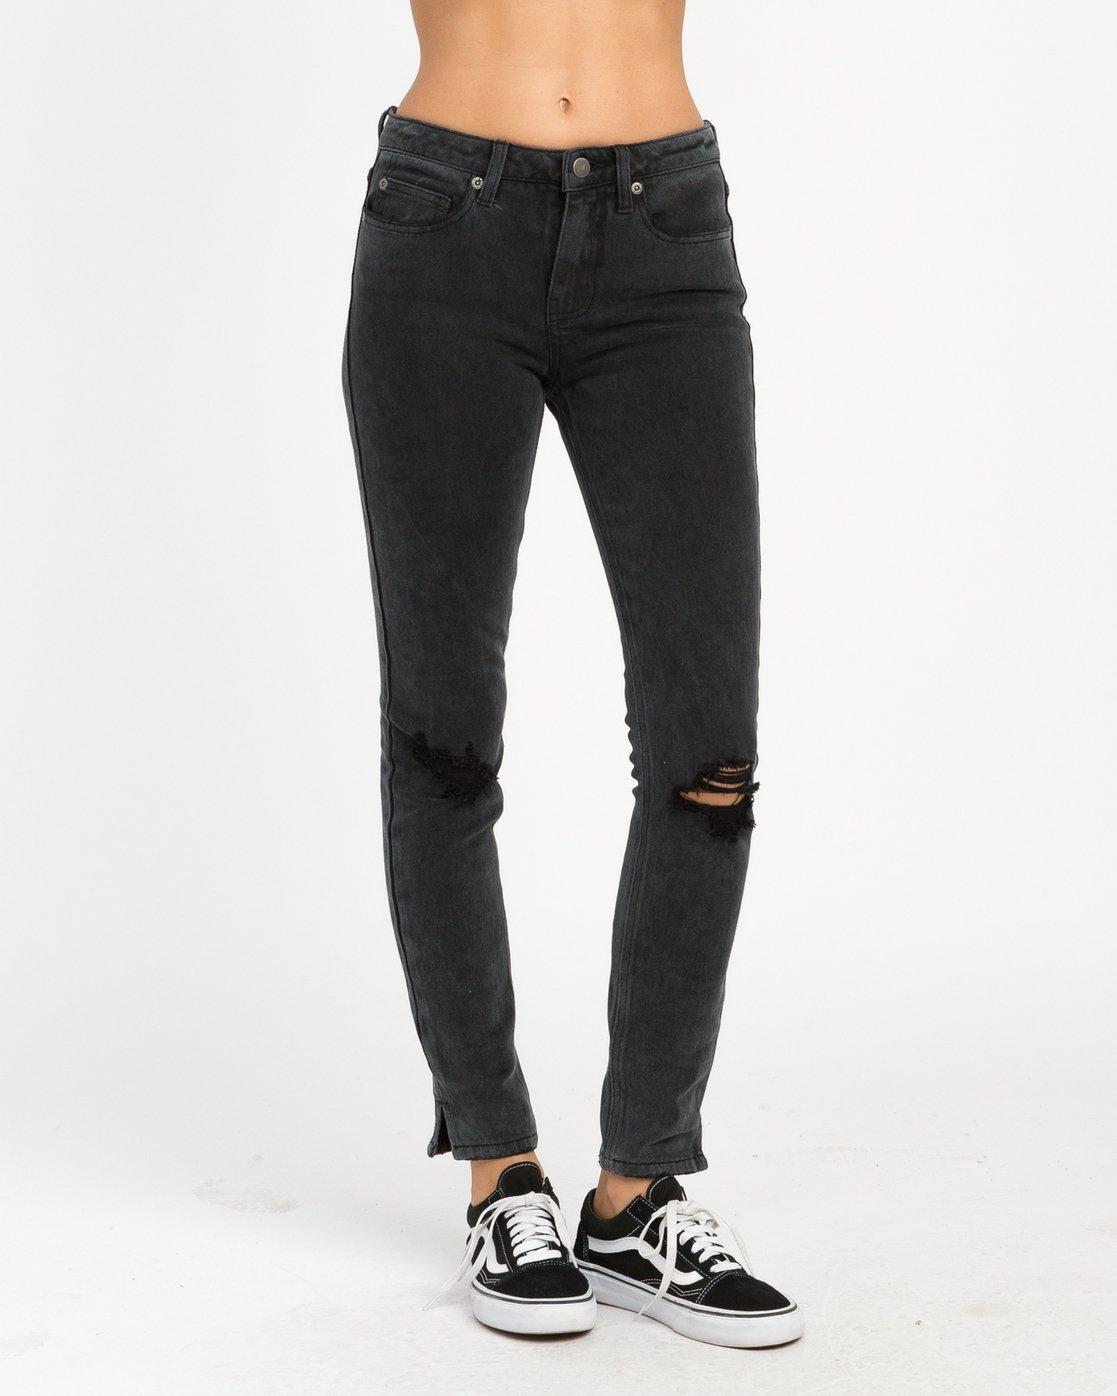 1 Dayley Mid Rise Denim Jeans Black WCDP02DA RVCA